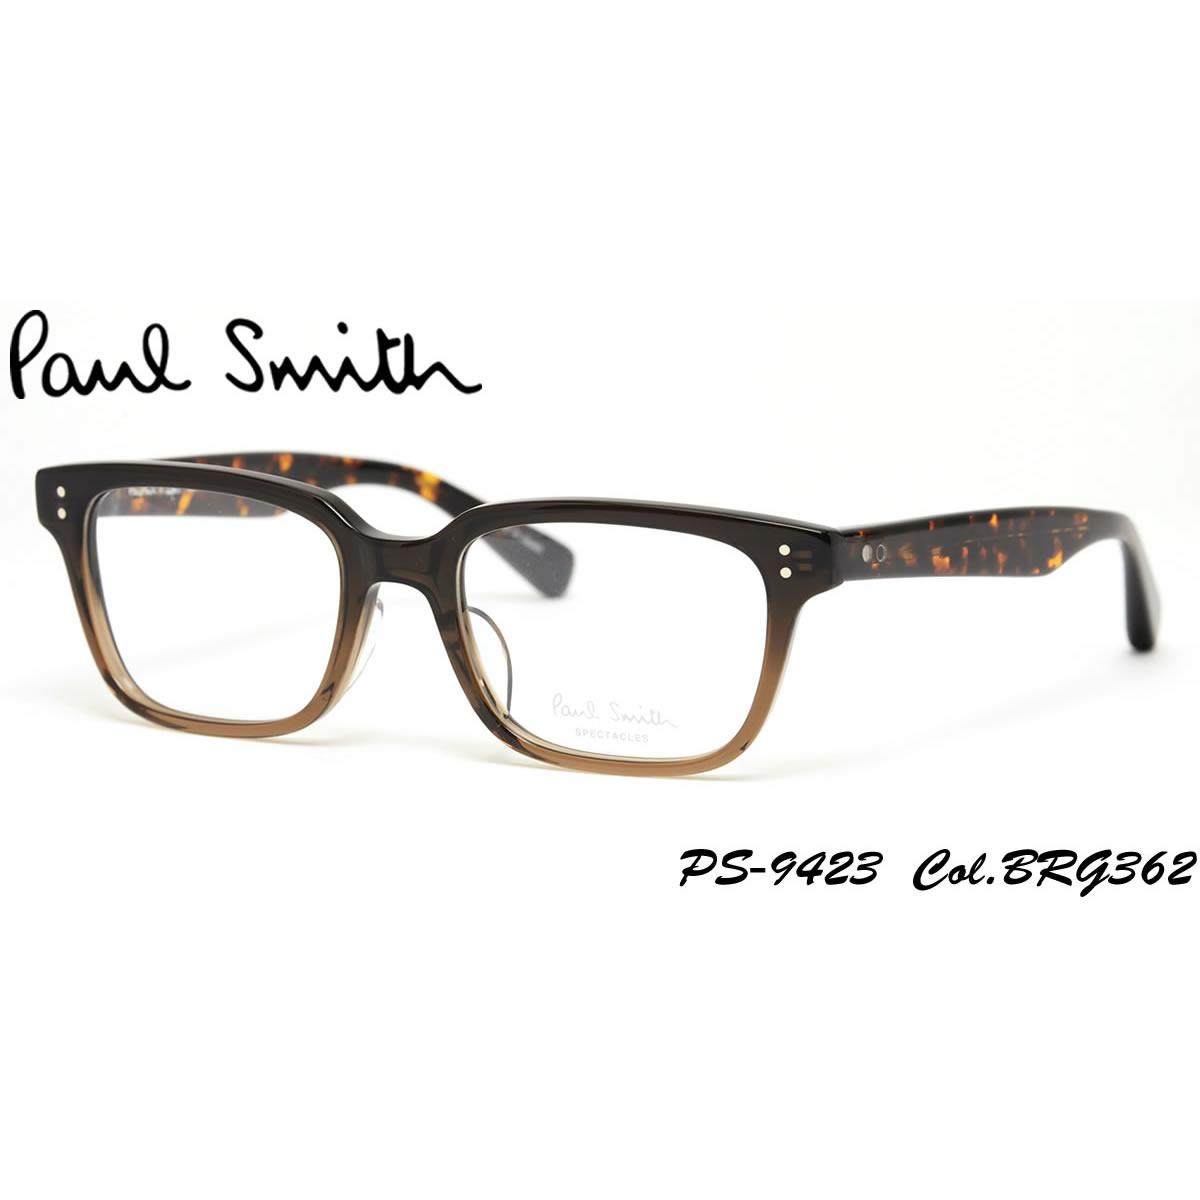 04b95639b44f1 Optical Shop Thats  PS-9423 BRG362 51 Paul Smith (Paul Smith ...